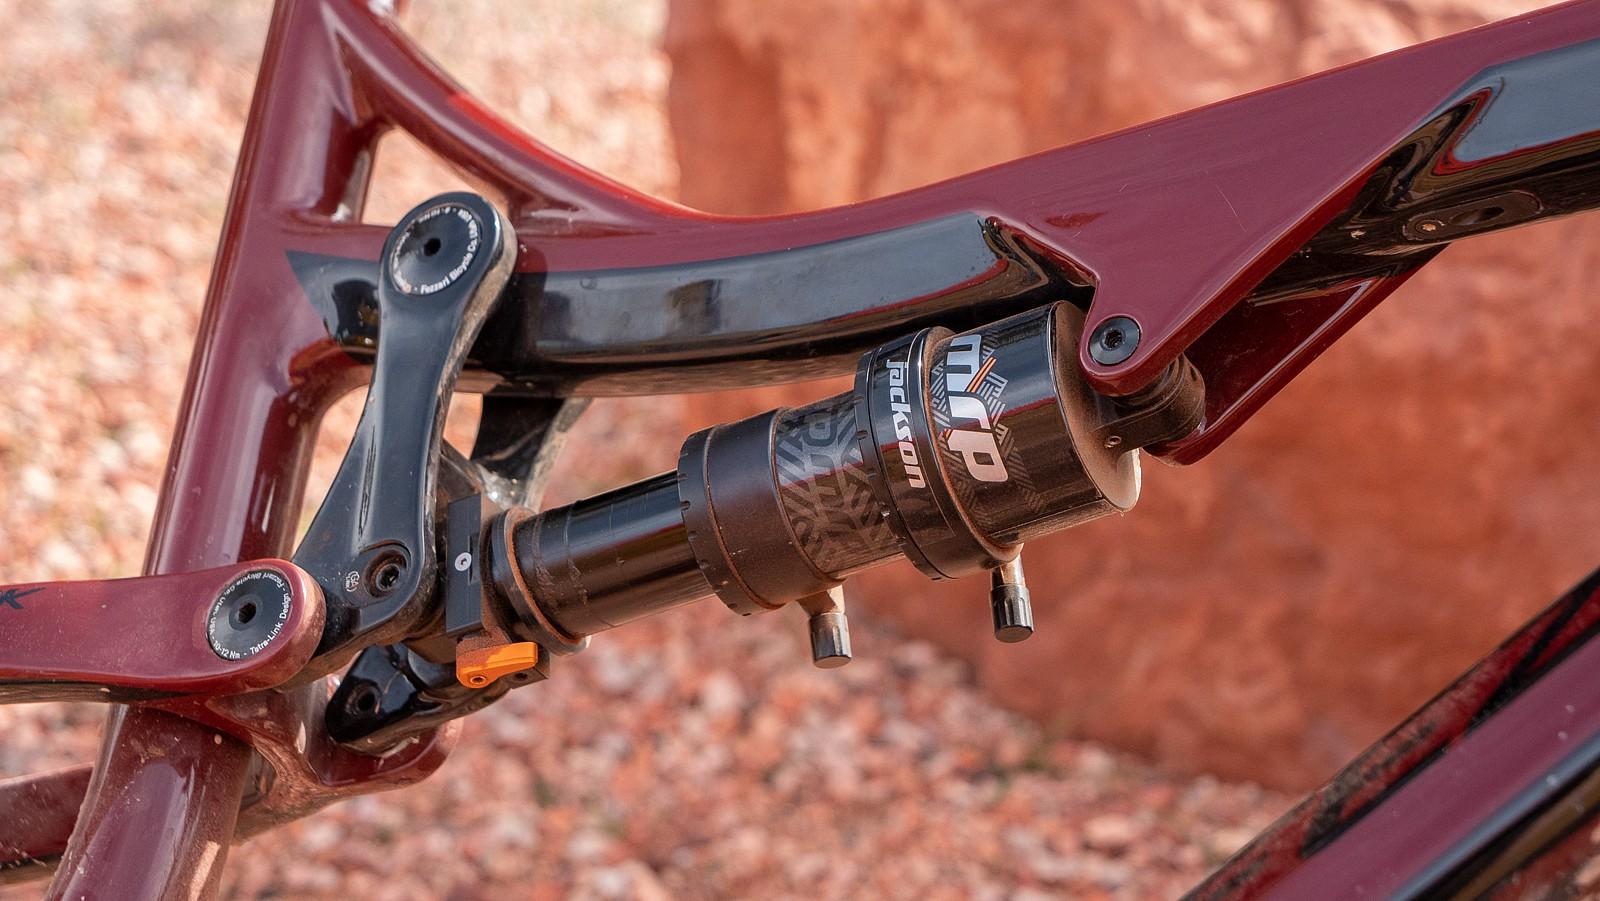 Prototype MRP Jackson Air Shock - PIT BITS - Sedona Mountain Bike Festival 2020 - Mountain Biking Pictures - Vital MTB